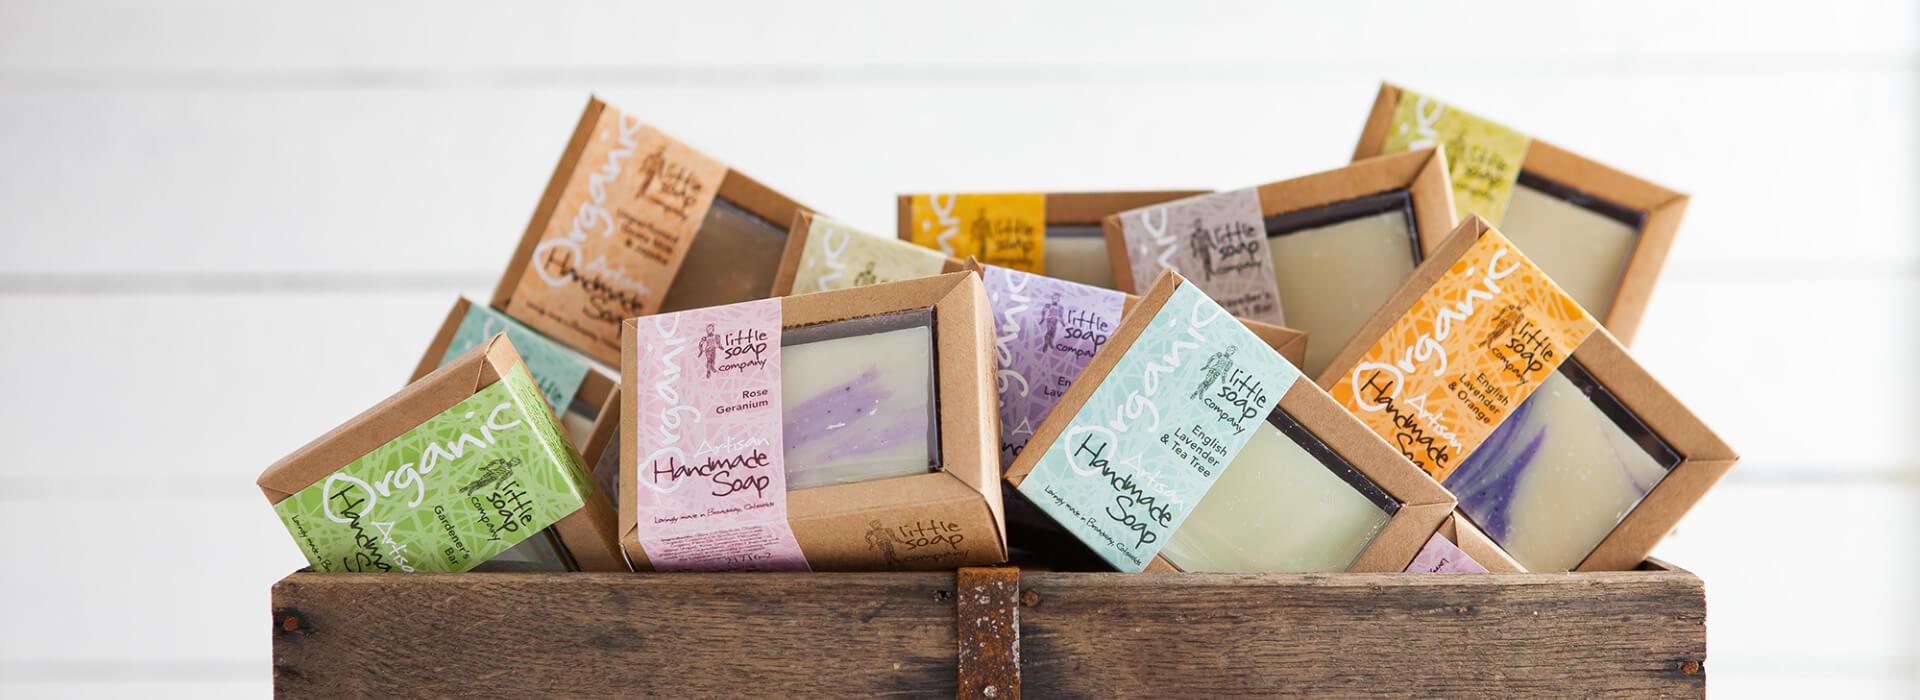 Soap crate